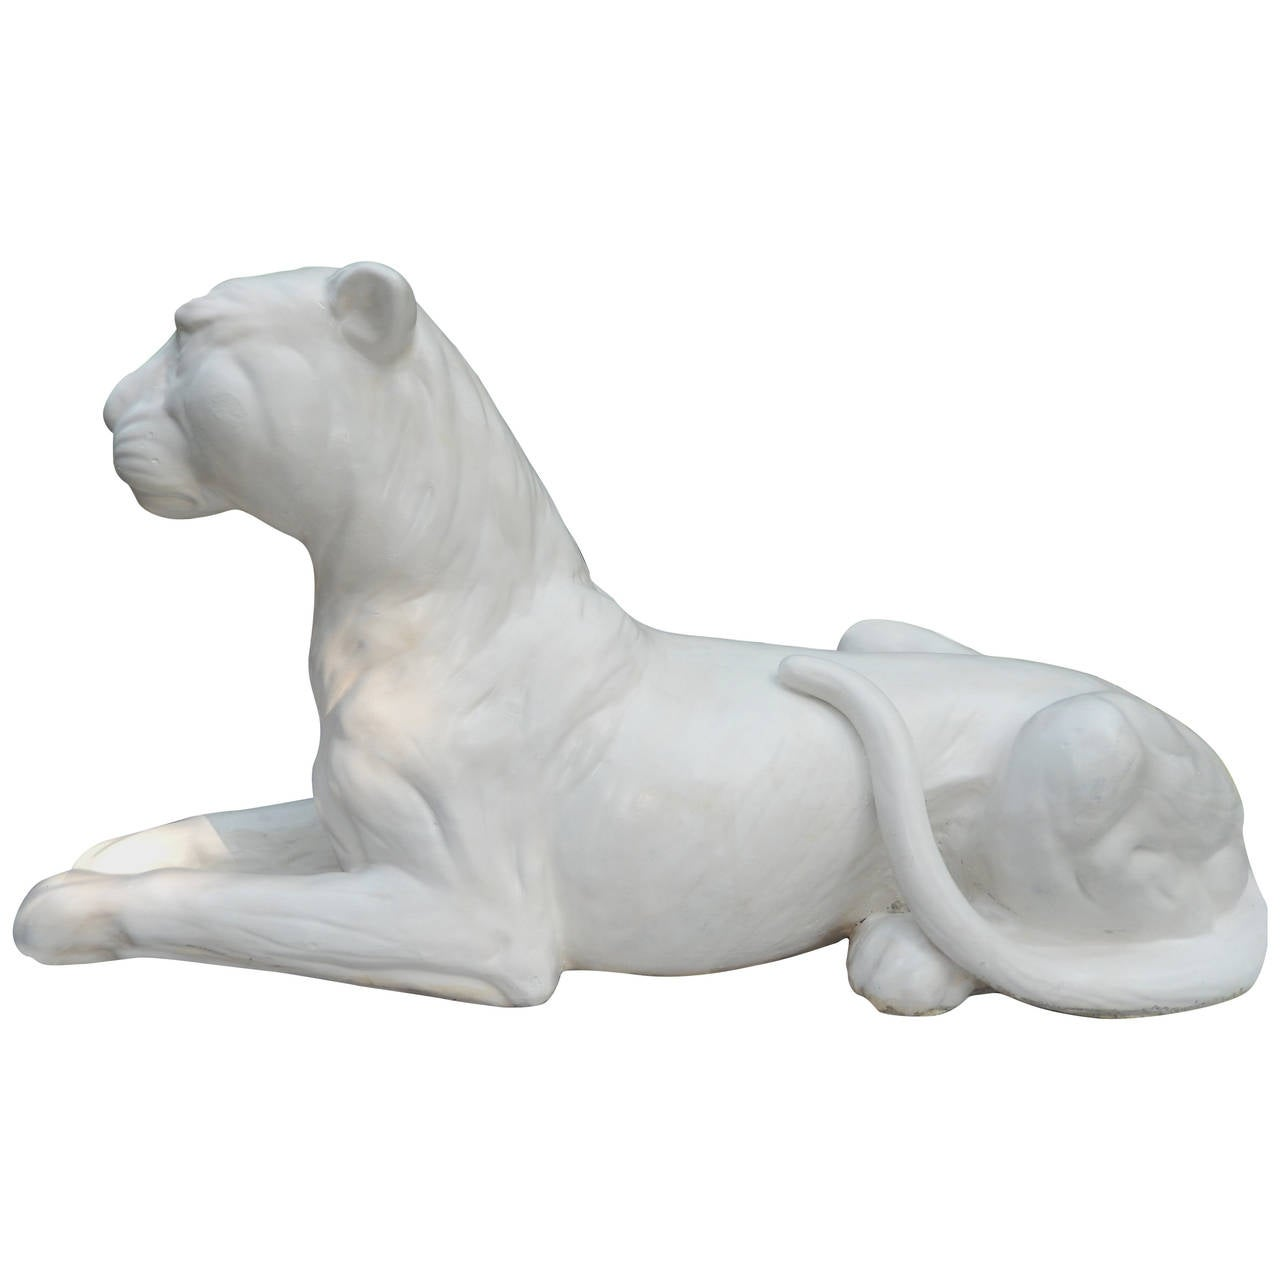 Large Bone White Glazed Pottery Lion Sculpture, After Meissen, 1930s